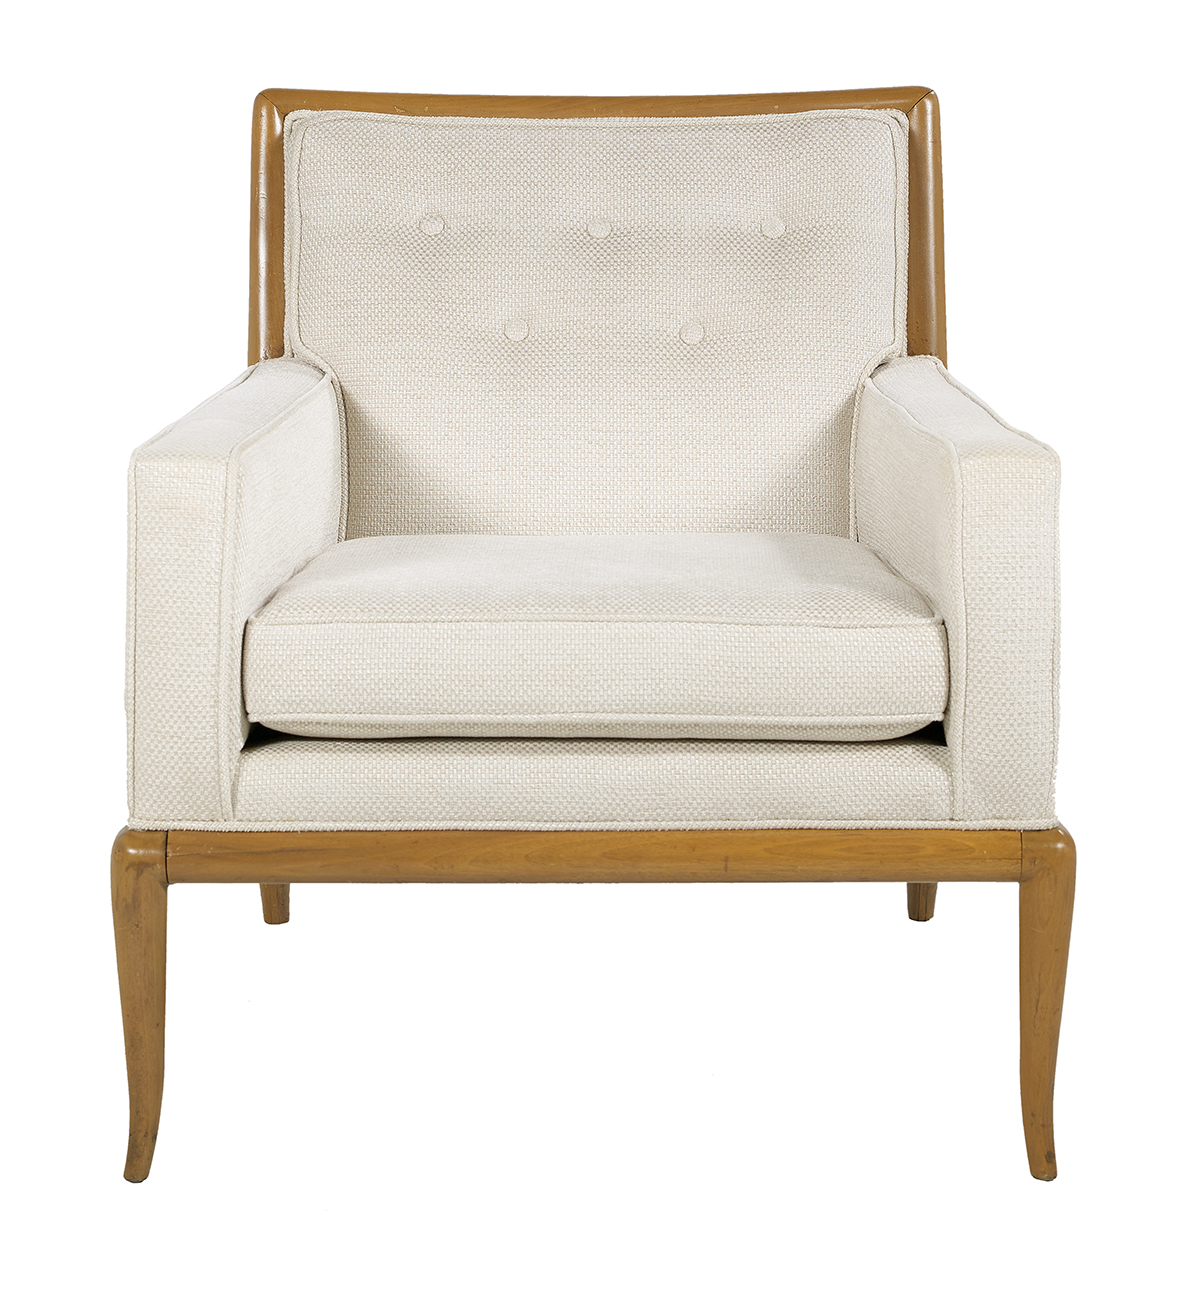 "Robsjohn-Gibbings Walnut ""WMP"" Lounge Chair - Image 2 of 2"